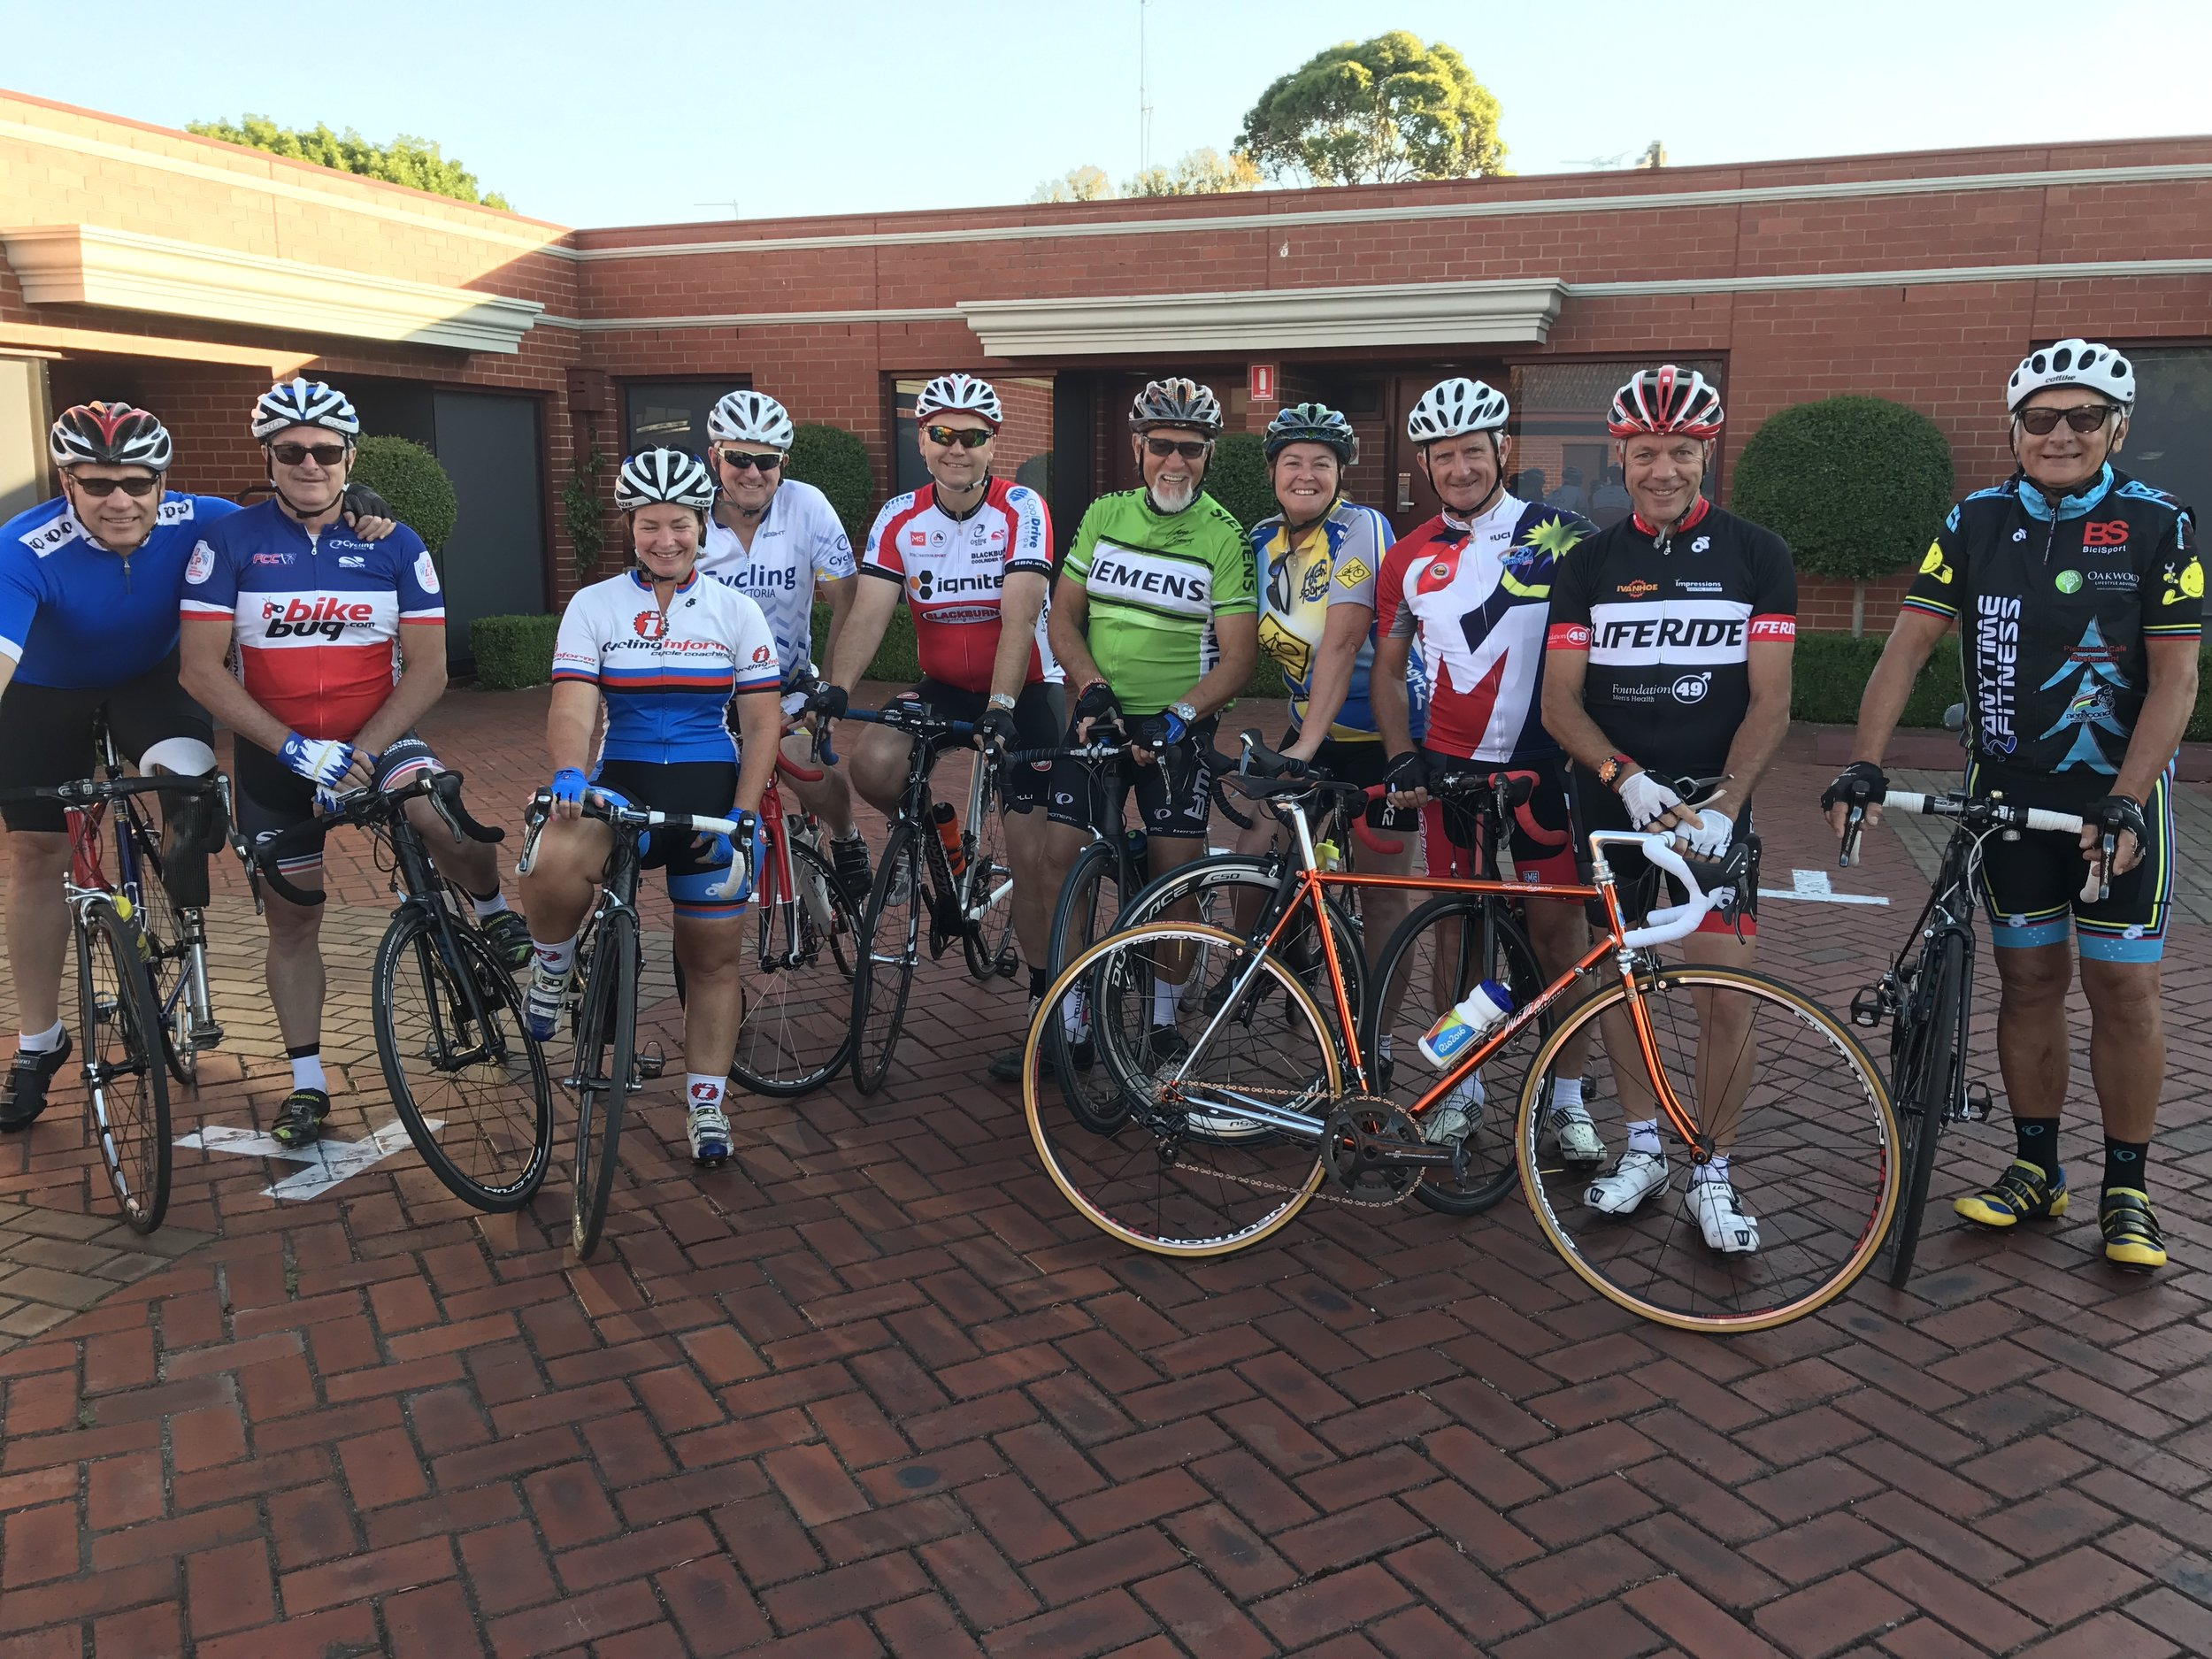 Ballarat 17 - Commissaires Grupetto Ride headed for Lake Wendouree. Alex Simmons (BiciSport) far left & John Crouchley far right.